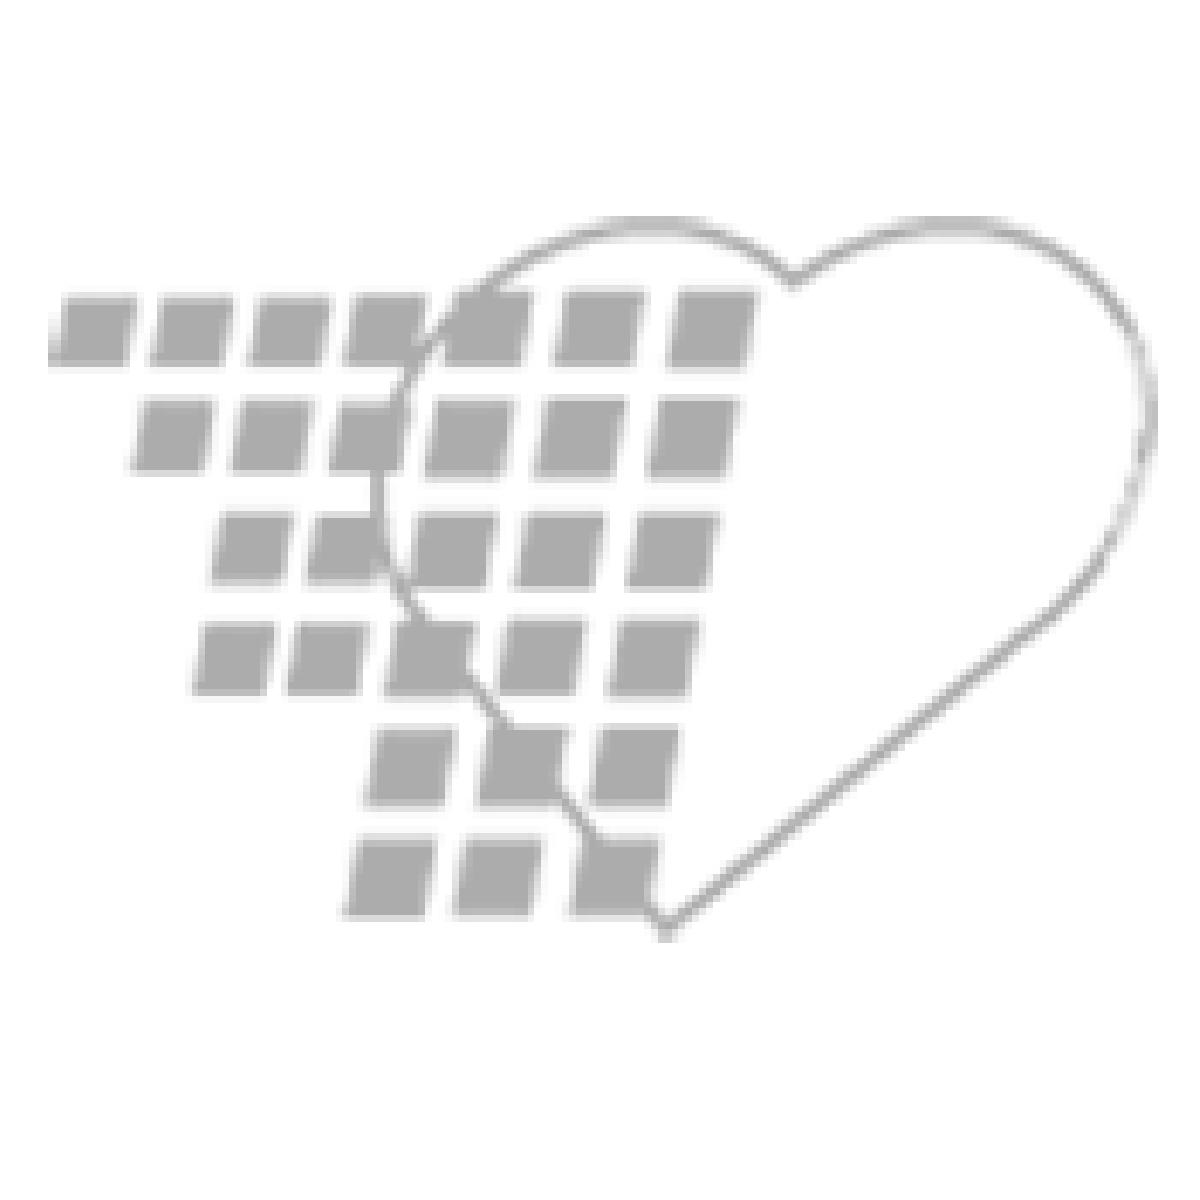 06-93-0048 Demo Dose® Glucotrl 5 mg - 100 Pills/Box